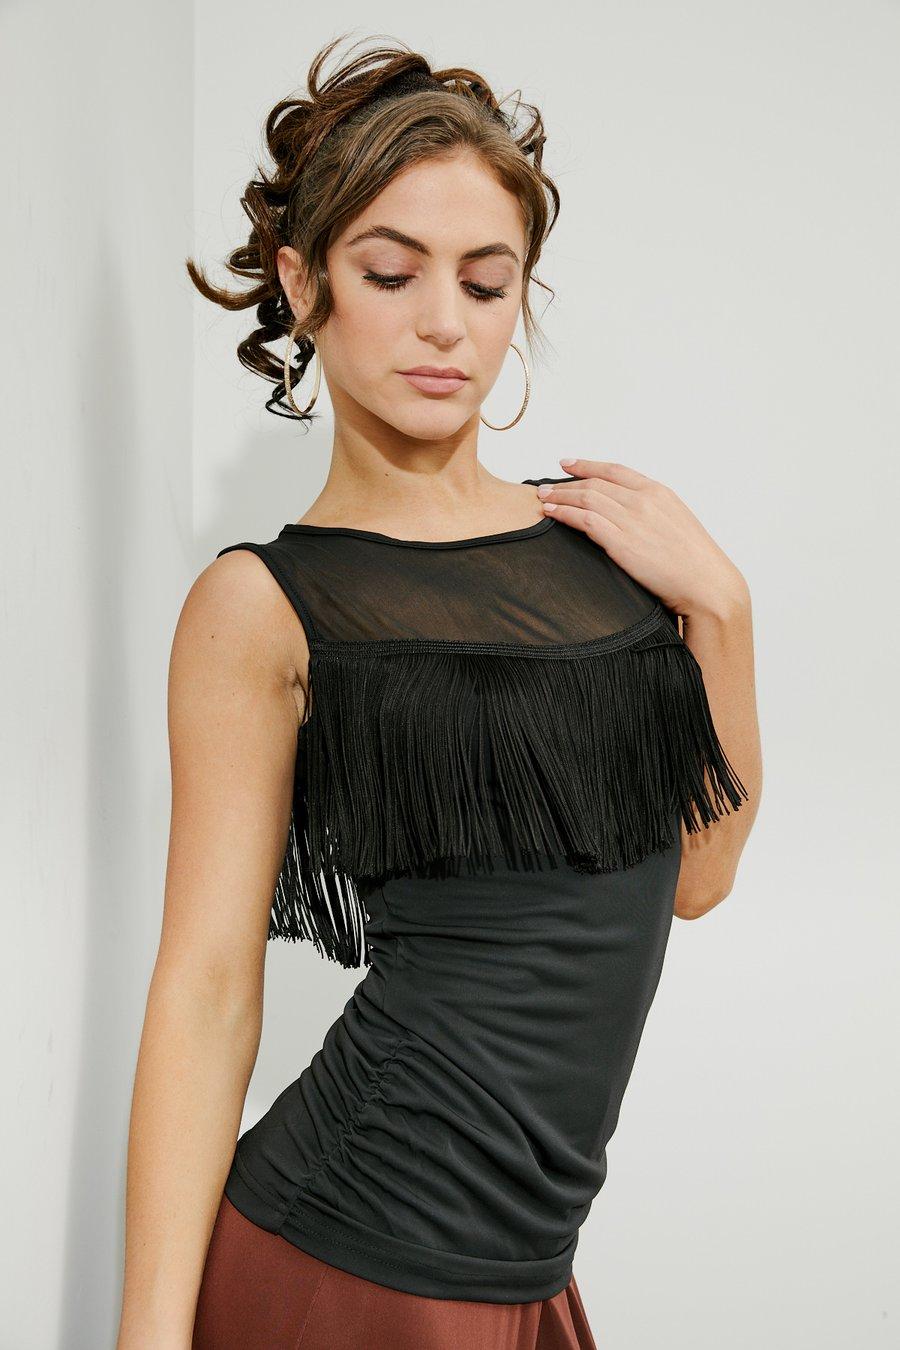 Image of Shivers Top E8692 Dancewear latin ballroom